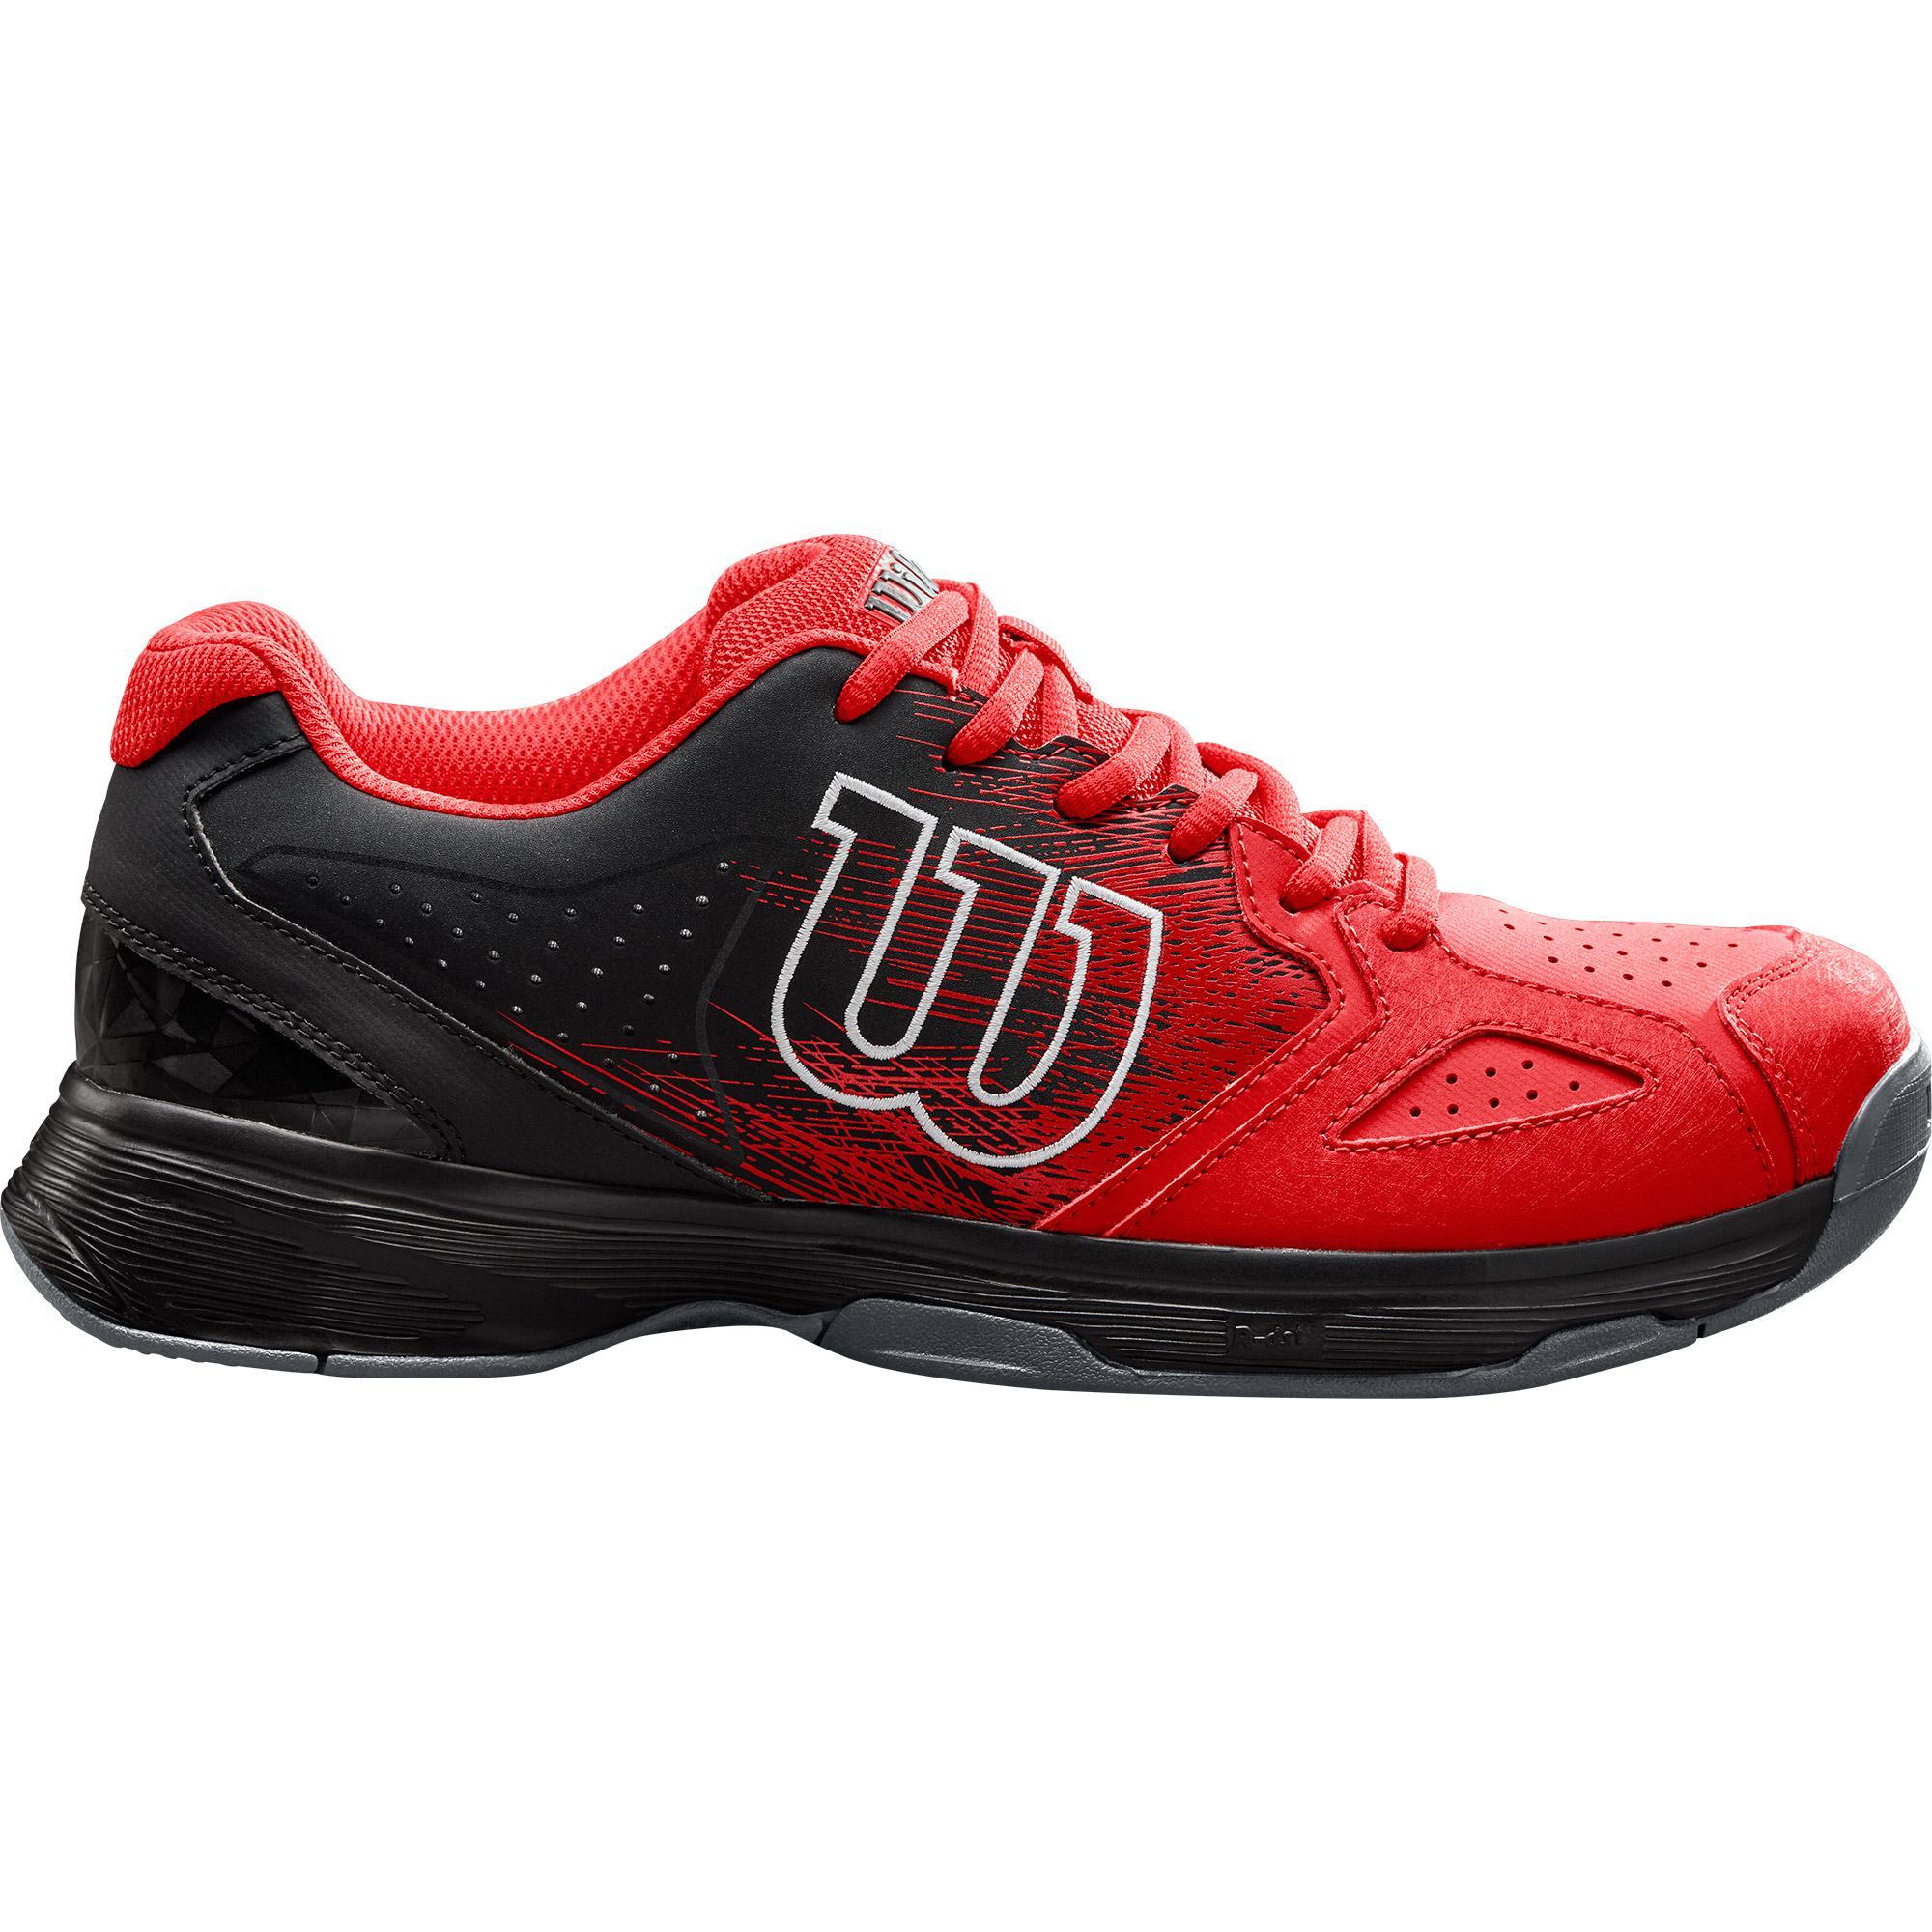 Mens KAOS Stroke Tennis Shoes, Black Wilson